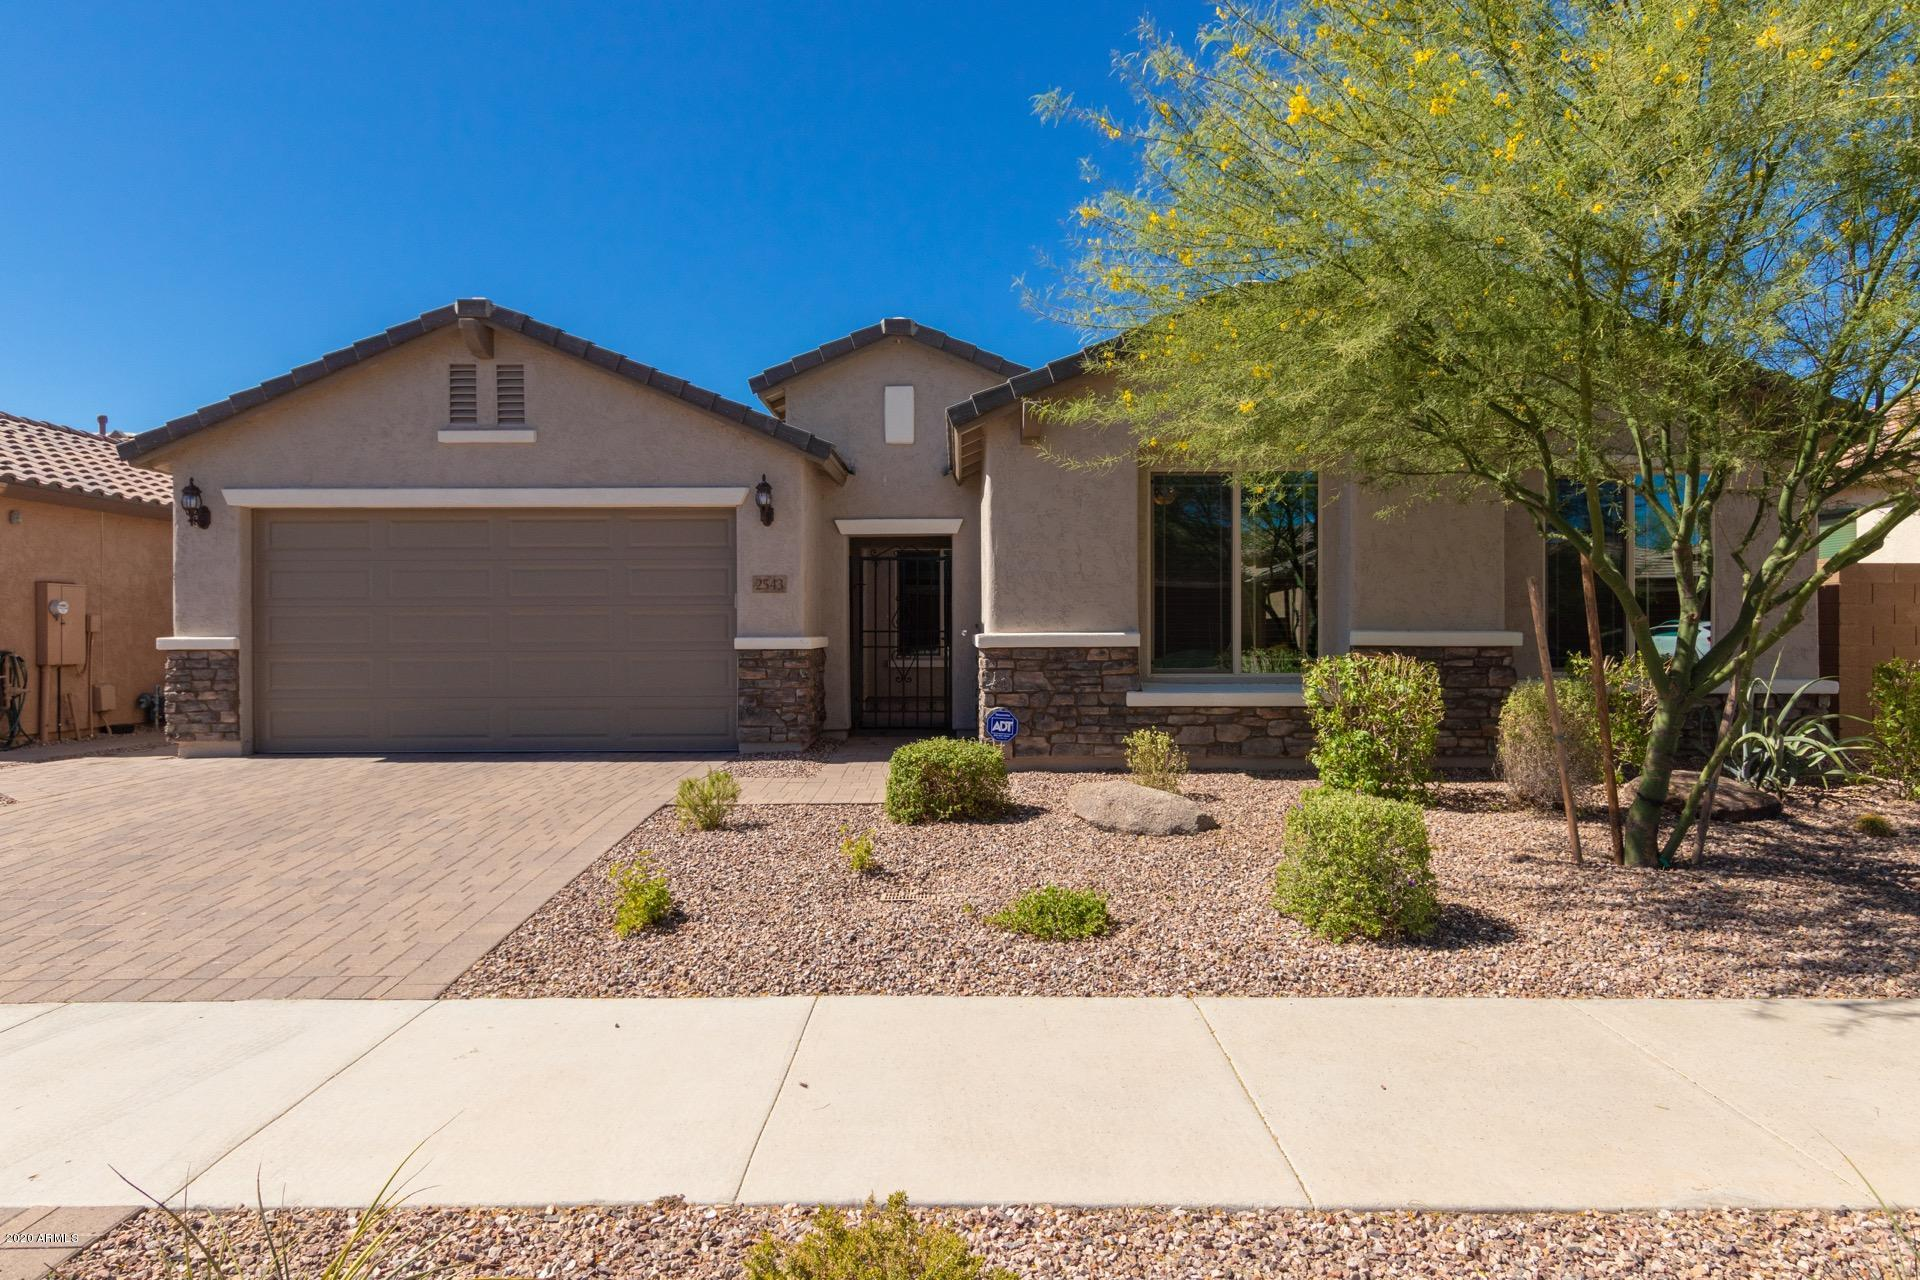 Photo of 2543 W RABJOHN Road, Phoenix, AZ 85085